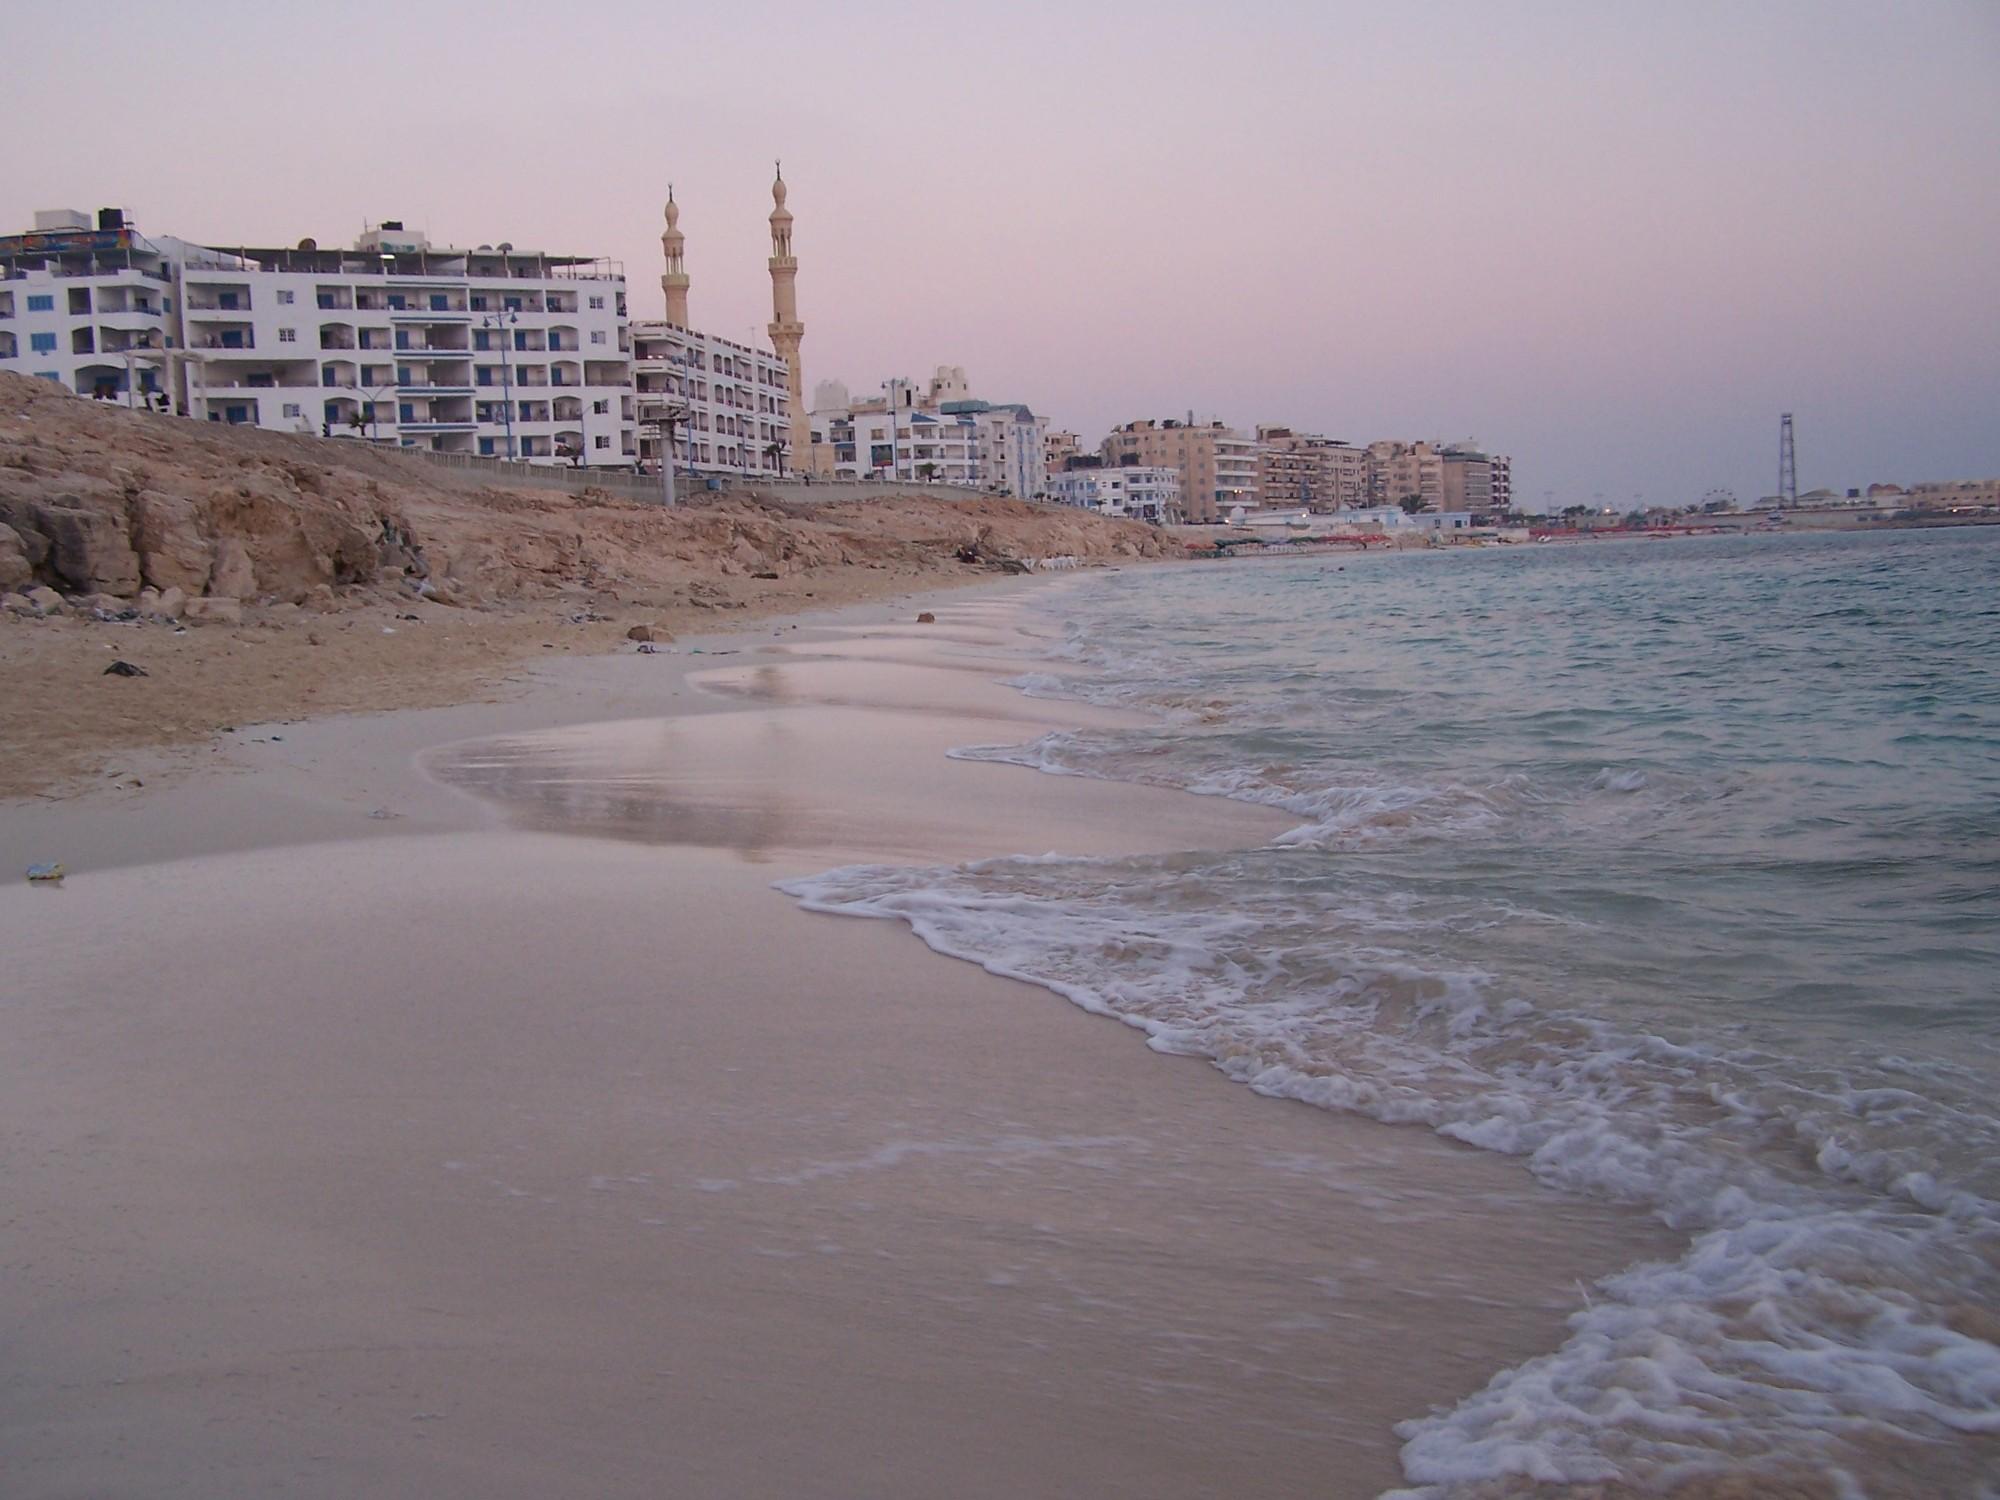 Marsa Matrouh Egypt  city photos : Marsa Matrouh Egypt Wikimedia Commons